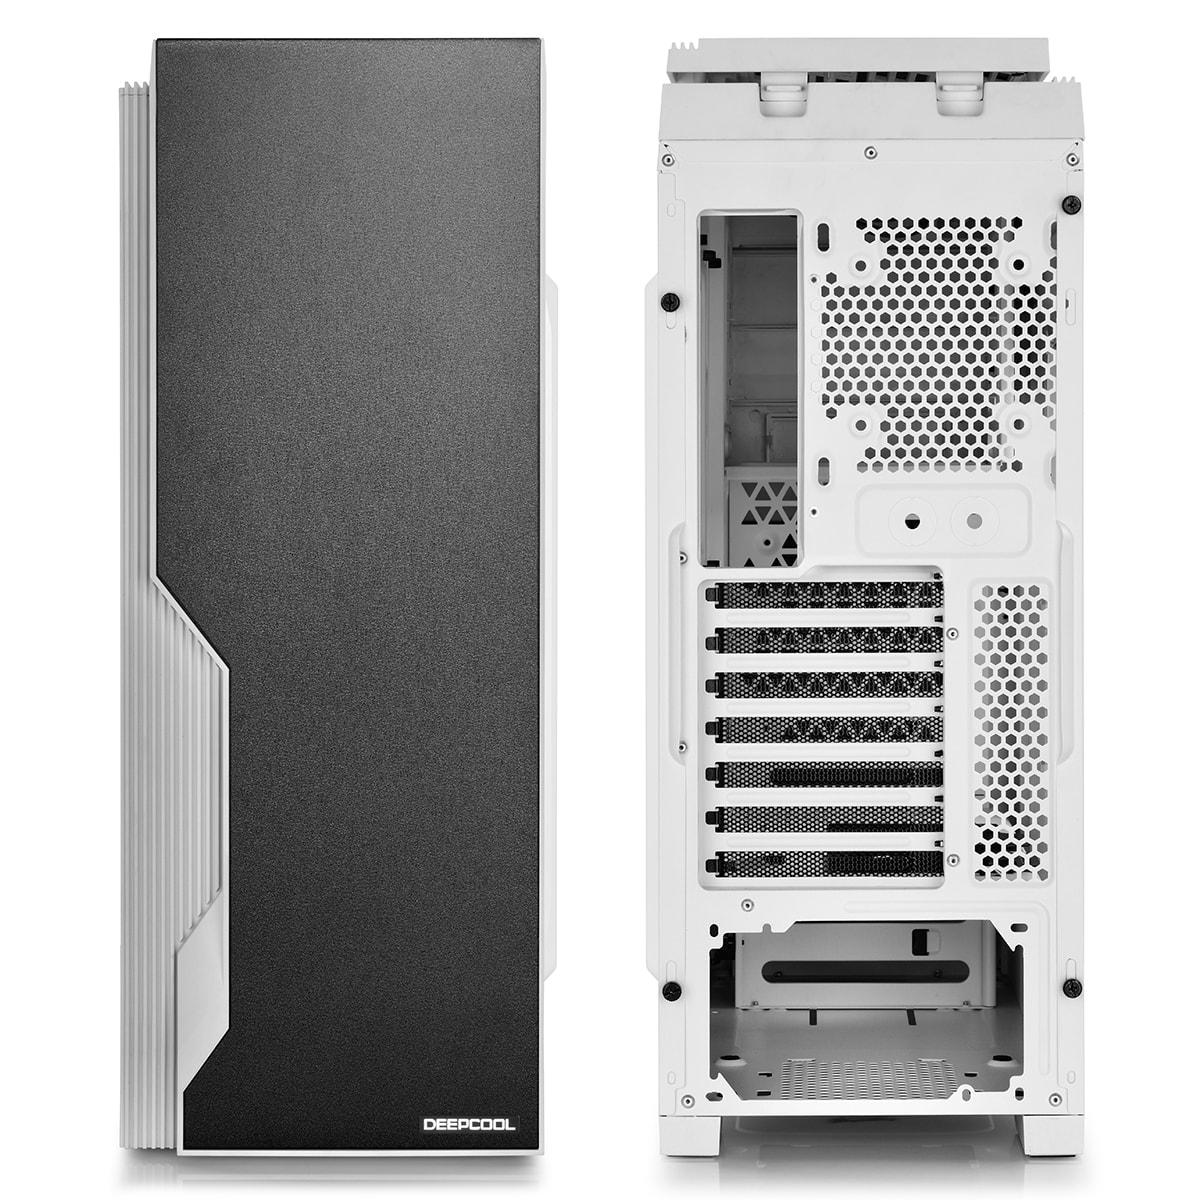 Deepcool mT/Ss Alim/ATX Blanc - Boîtier PC Deepcool - Cybertek.fr - 4